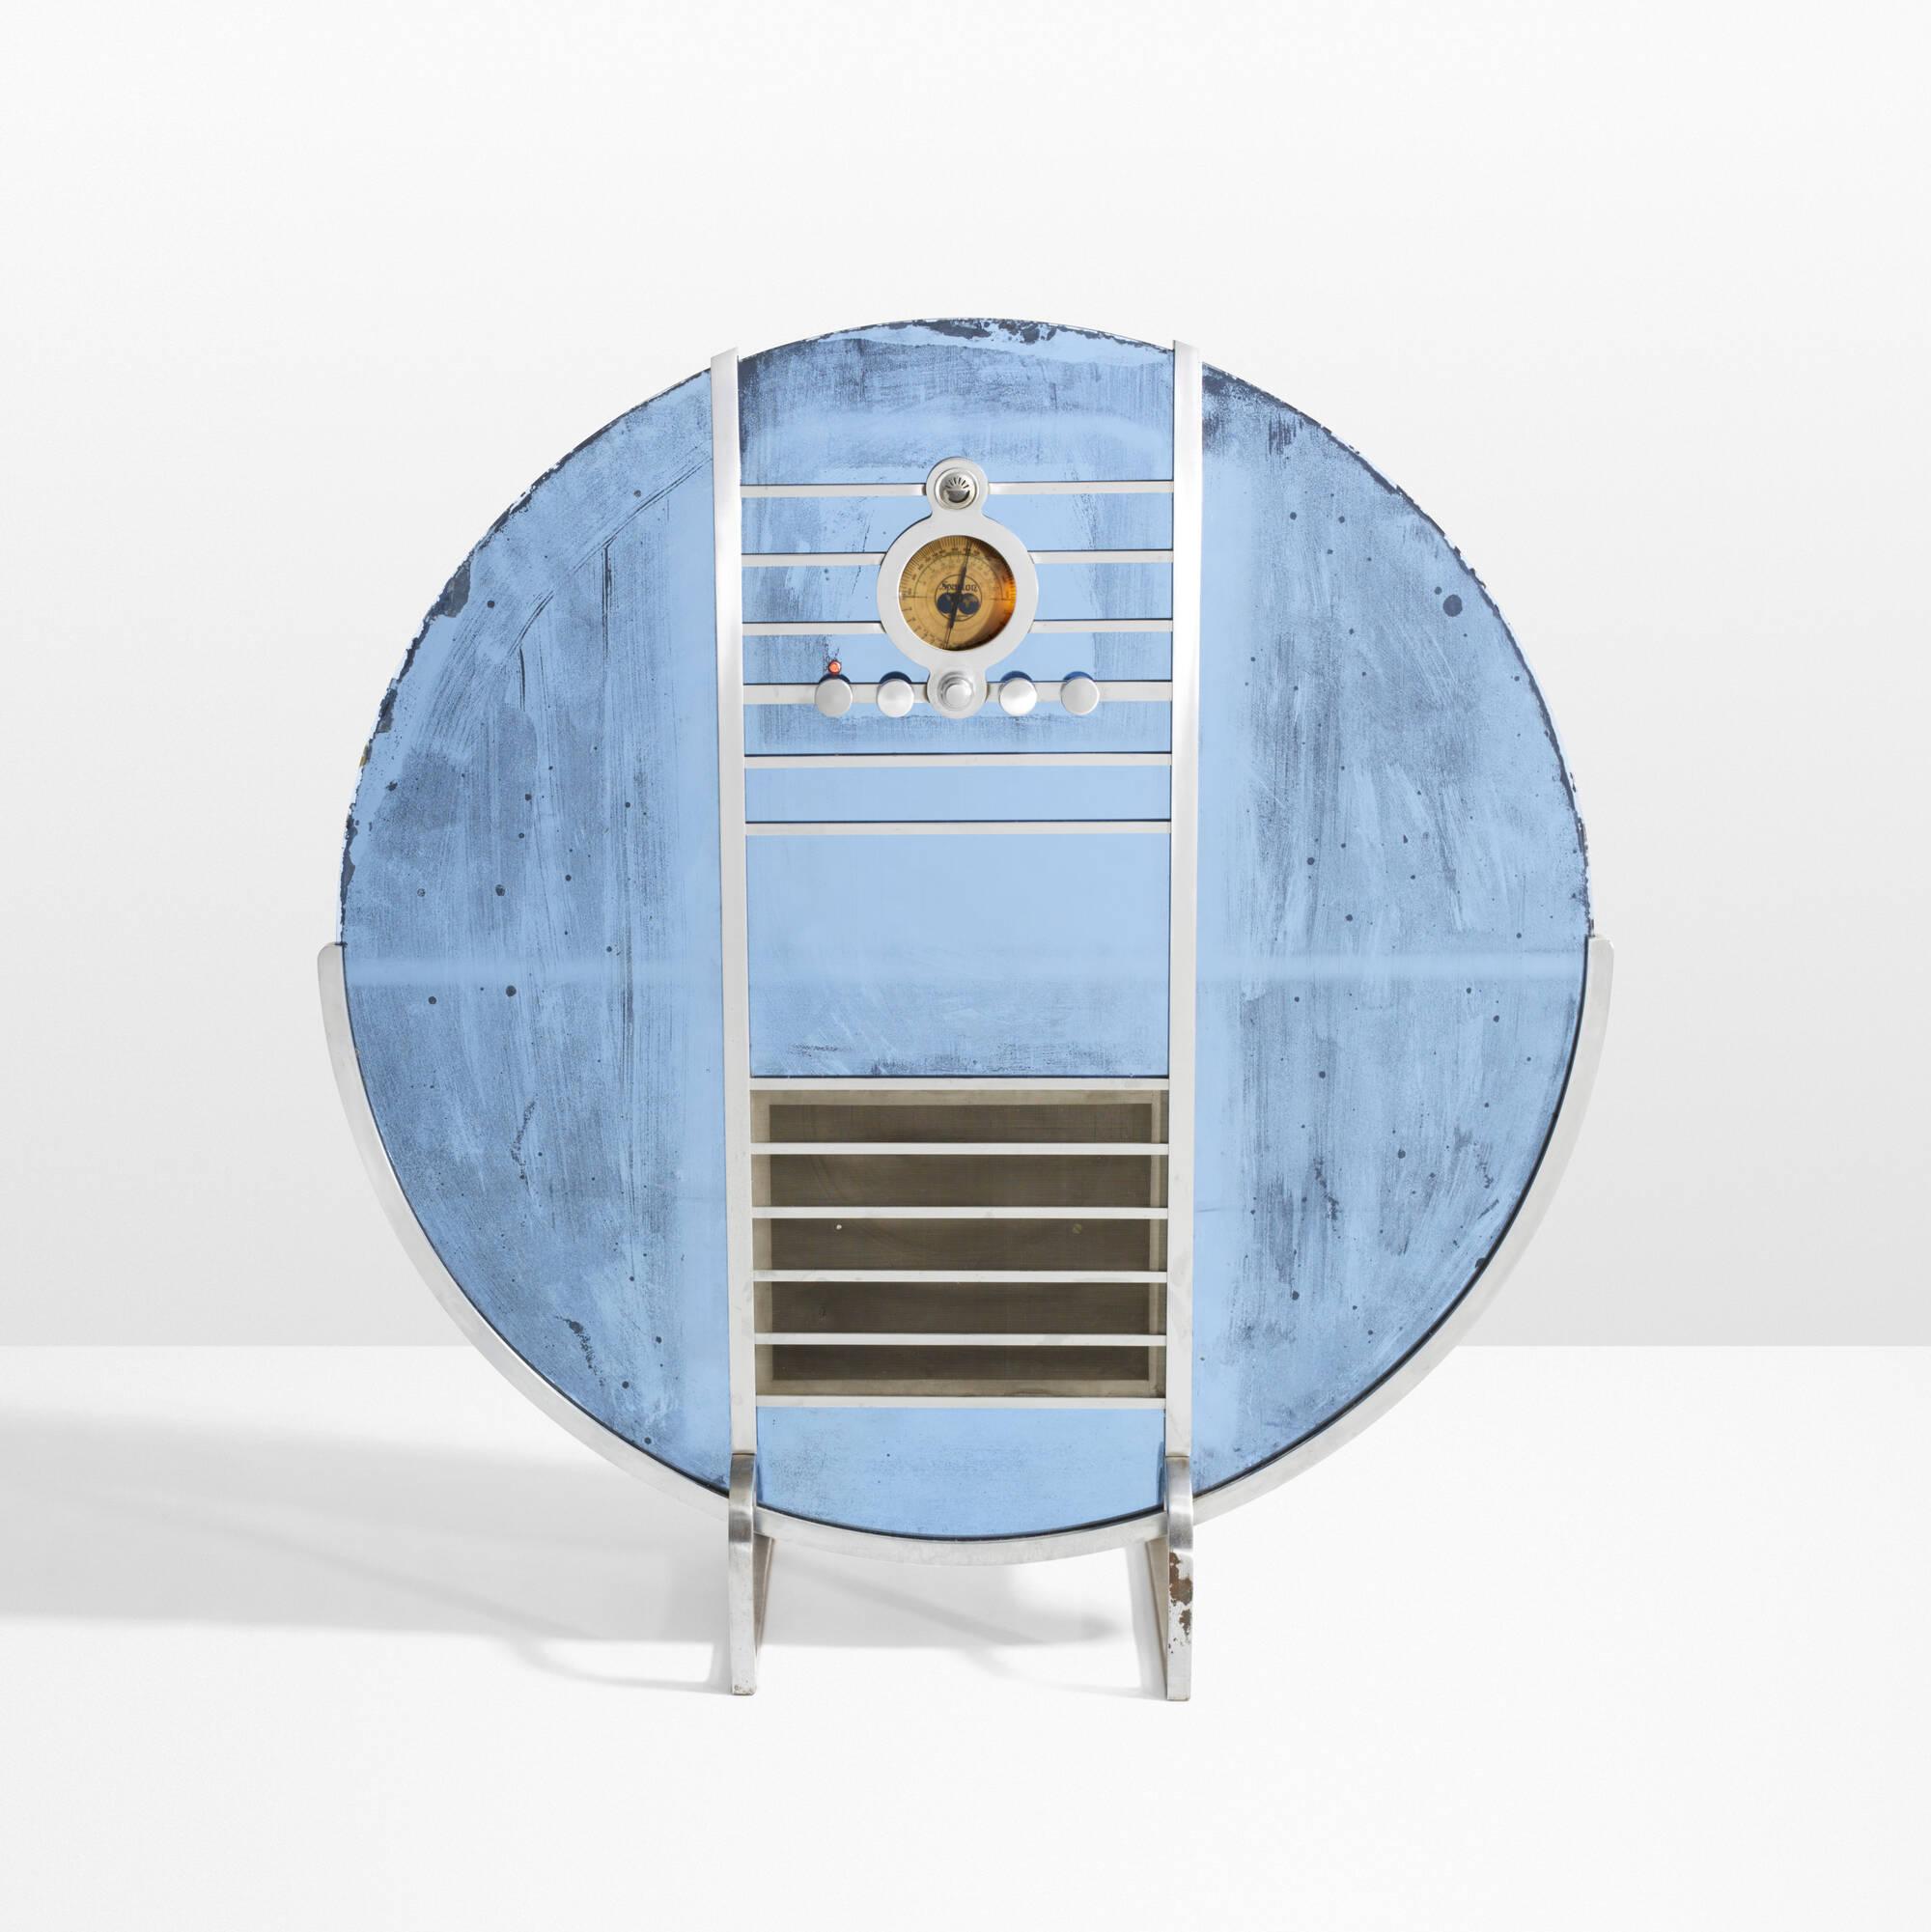 7: Walter Dorwin Teague / Nocturne radio, model 1186 (1 of 3)